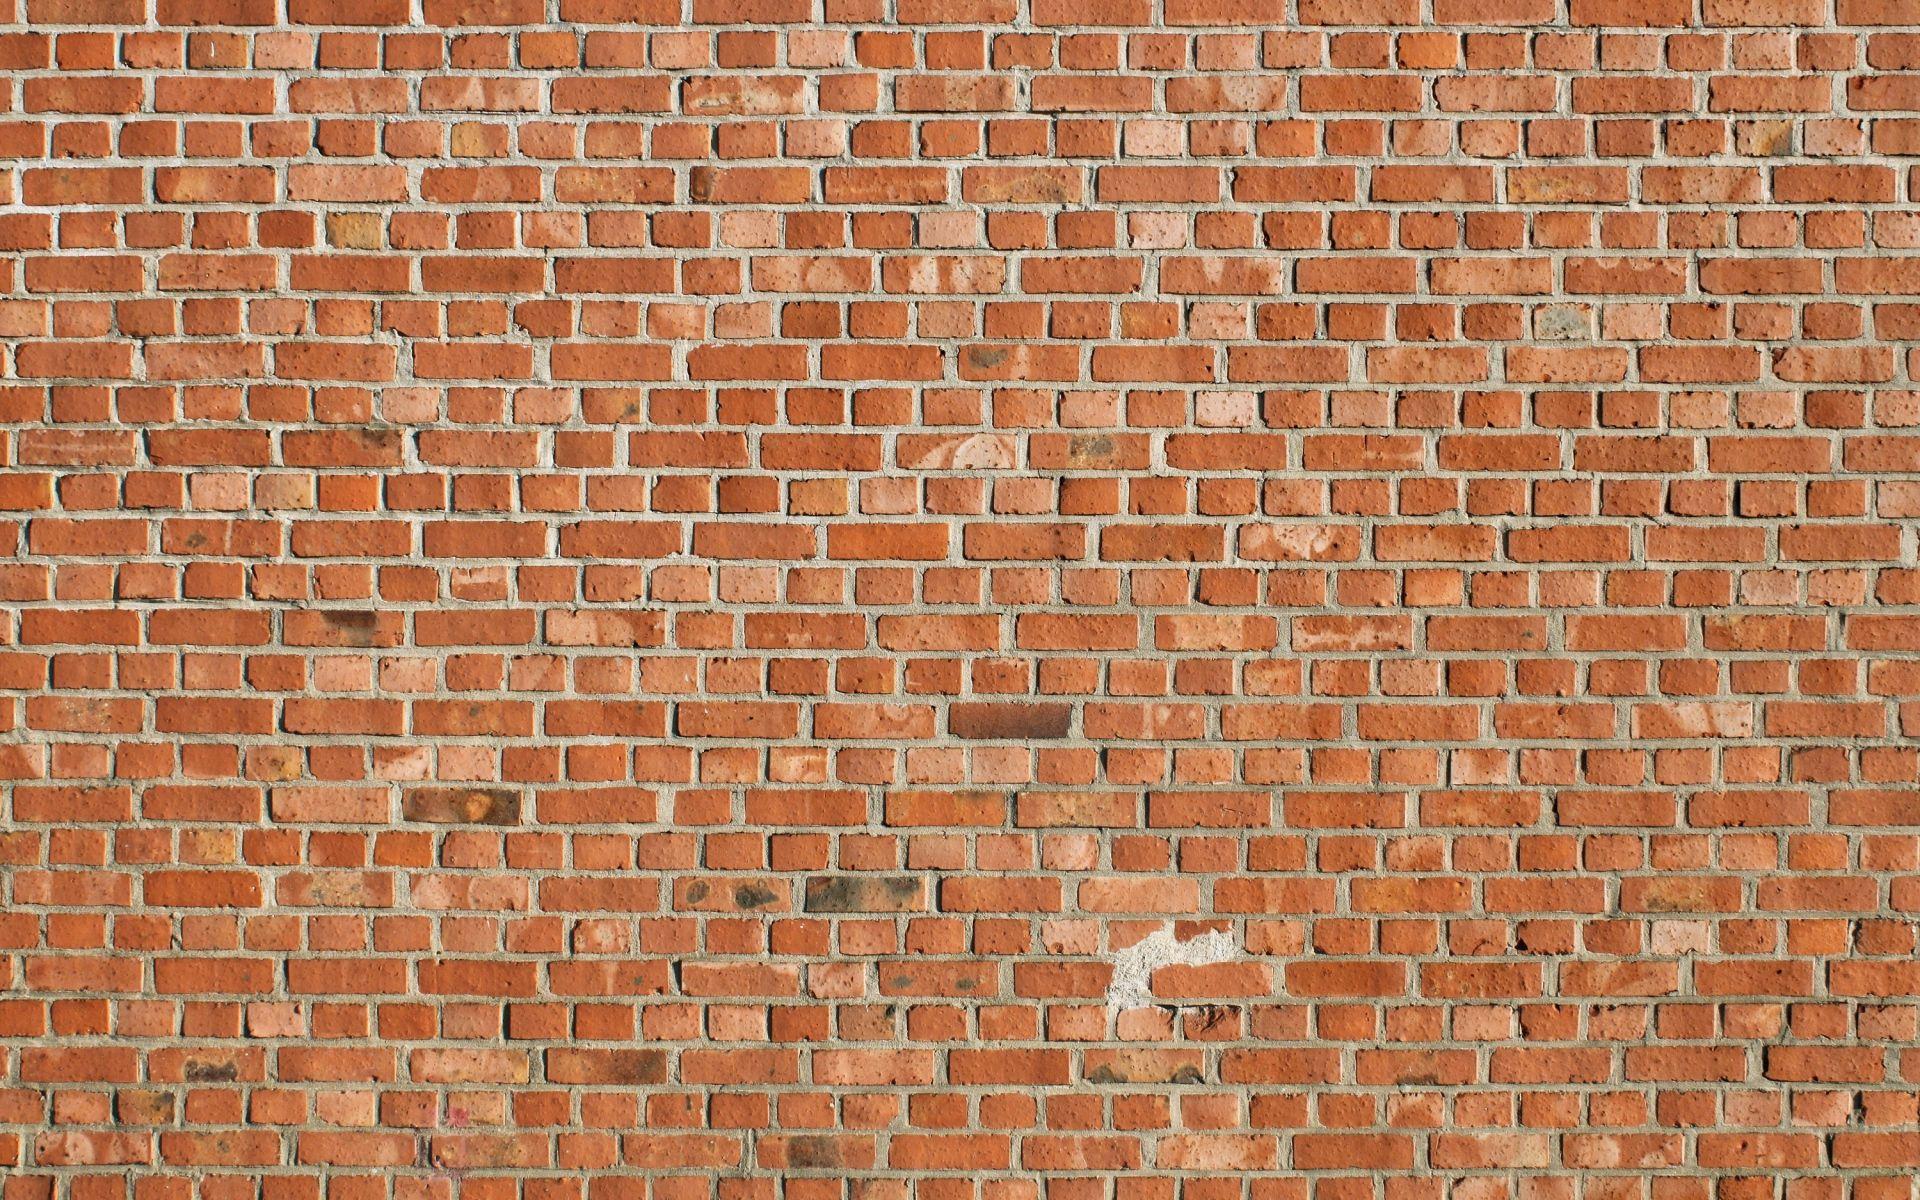 Download Wallpaper 1920x1200 Texture Brick Wall 1920x1200 Hd Tijolo Parede De Tijolos Tipos De Texturas